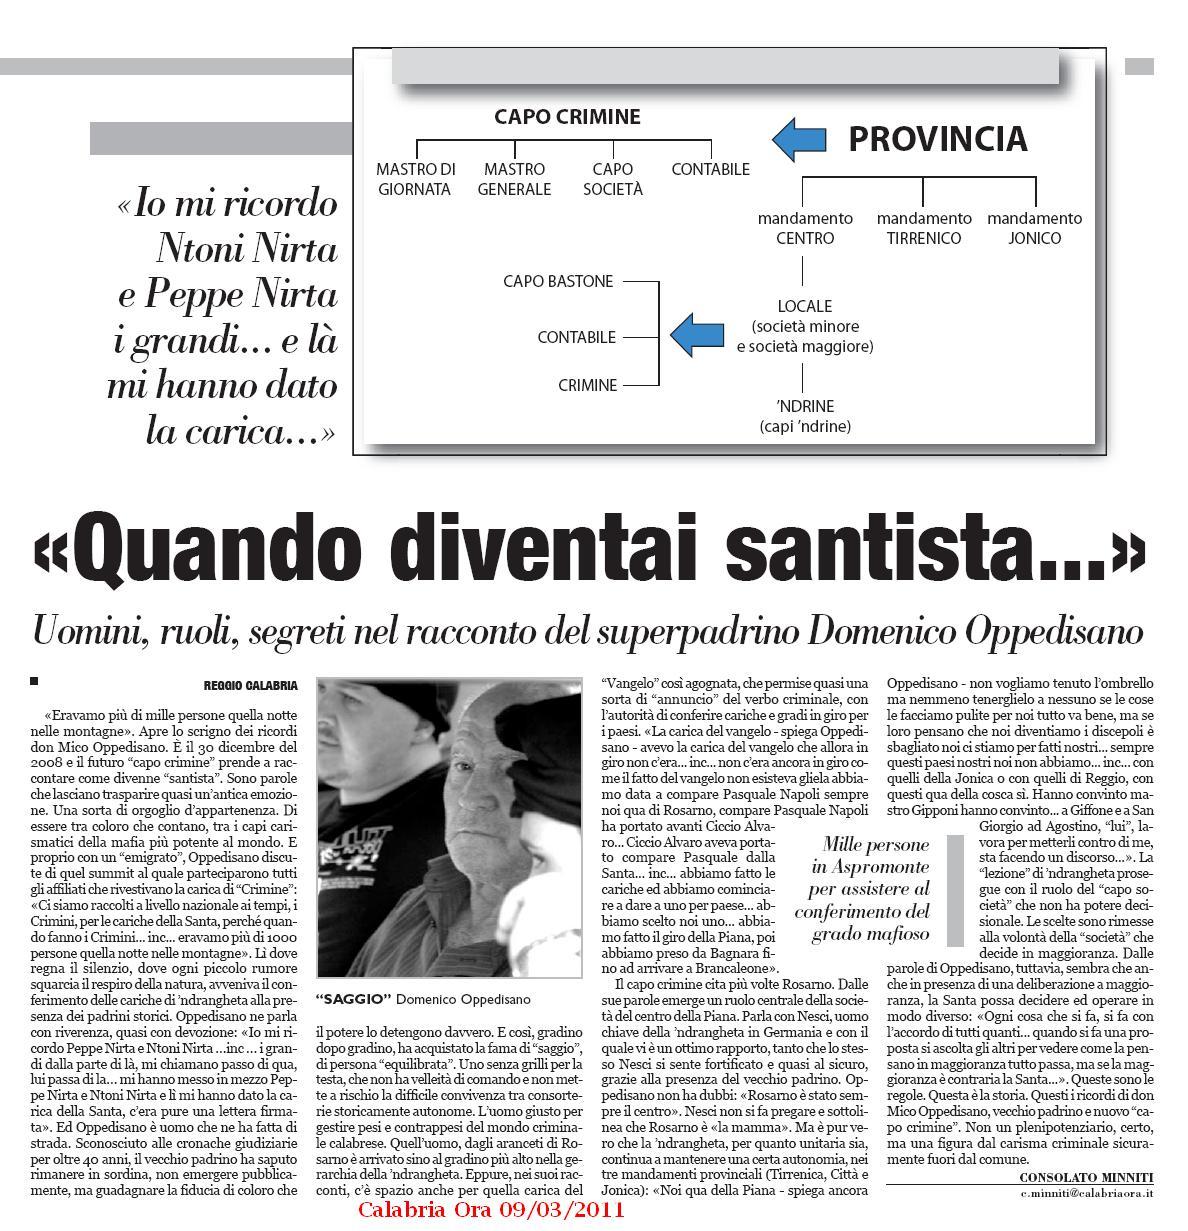 Origins and development of the ndrangheta springerlink accessed 9 march 2011 fandeluxe Gallery